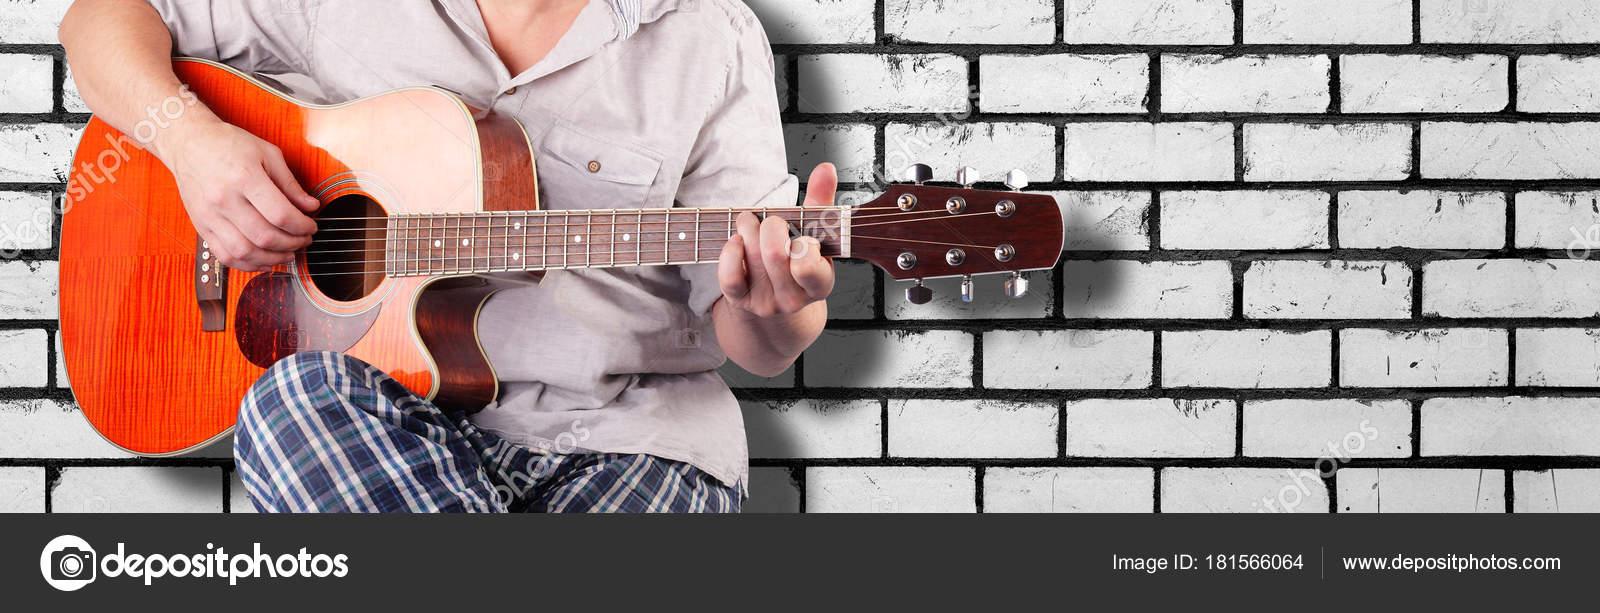 Music Orange Electric Acoustic Guitar Player Chord C White Bri